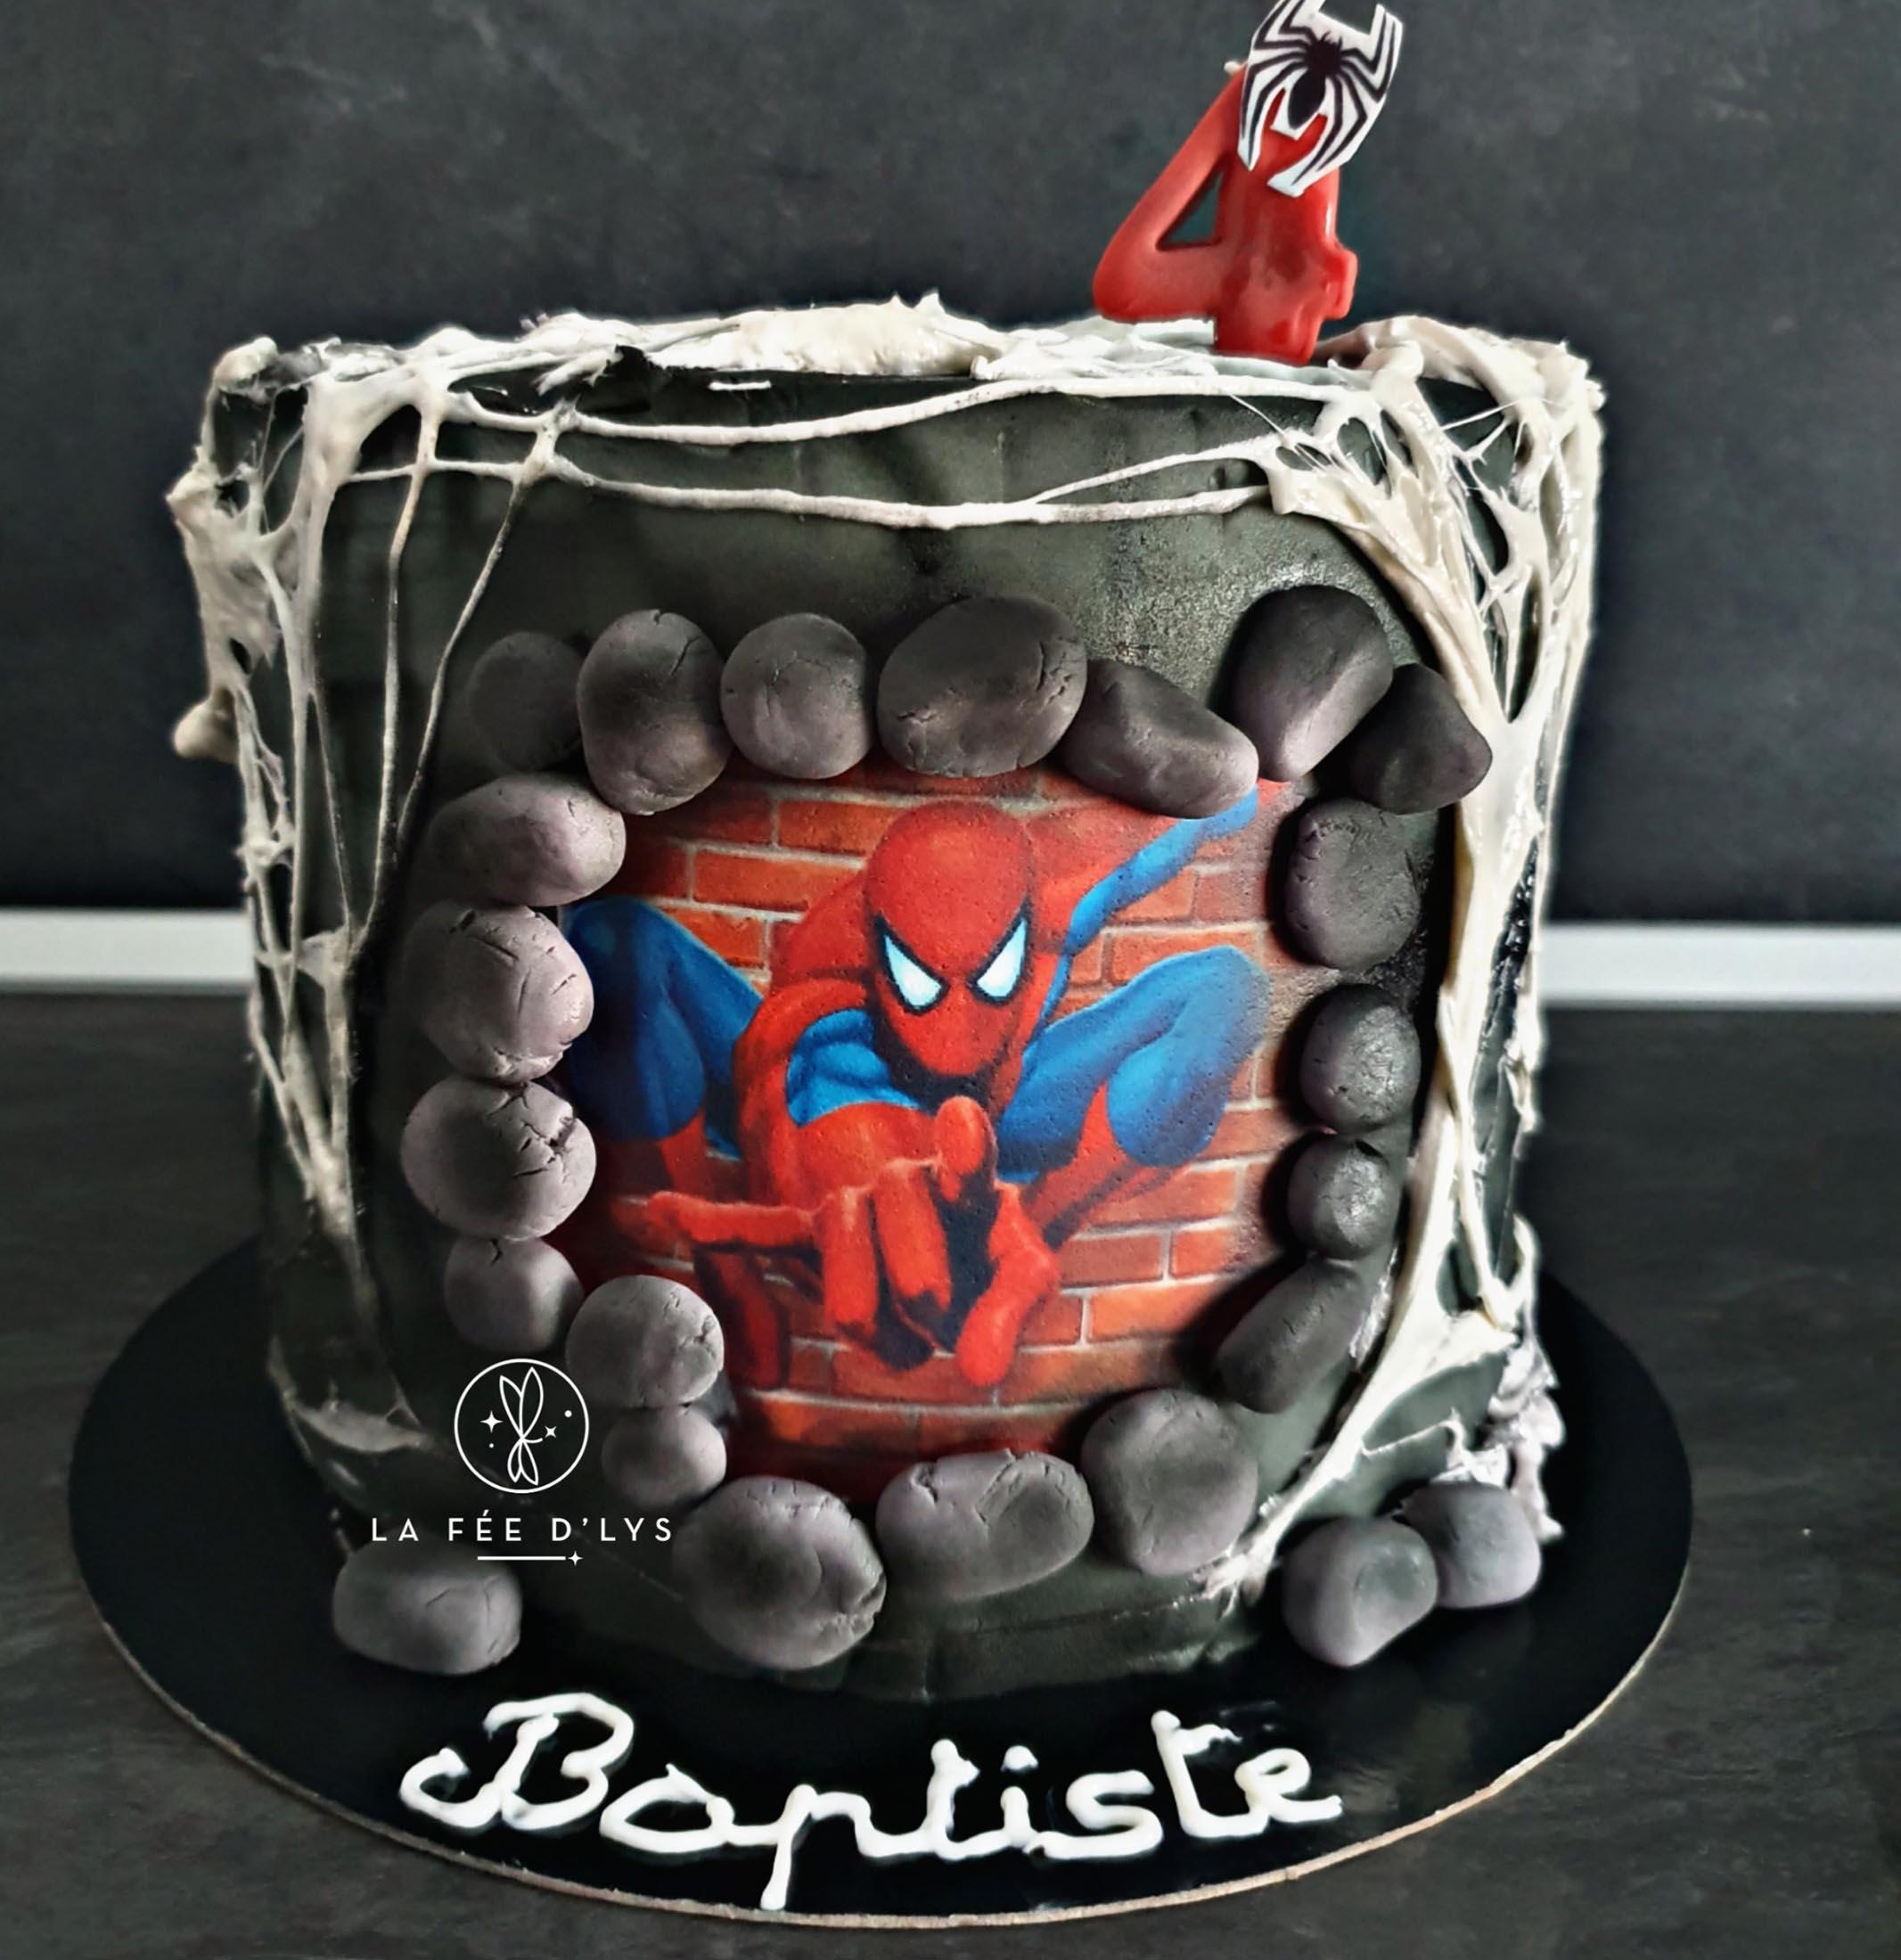 Cake Design - Baptiste